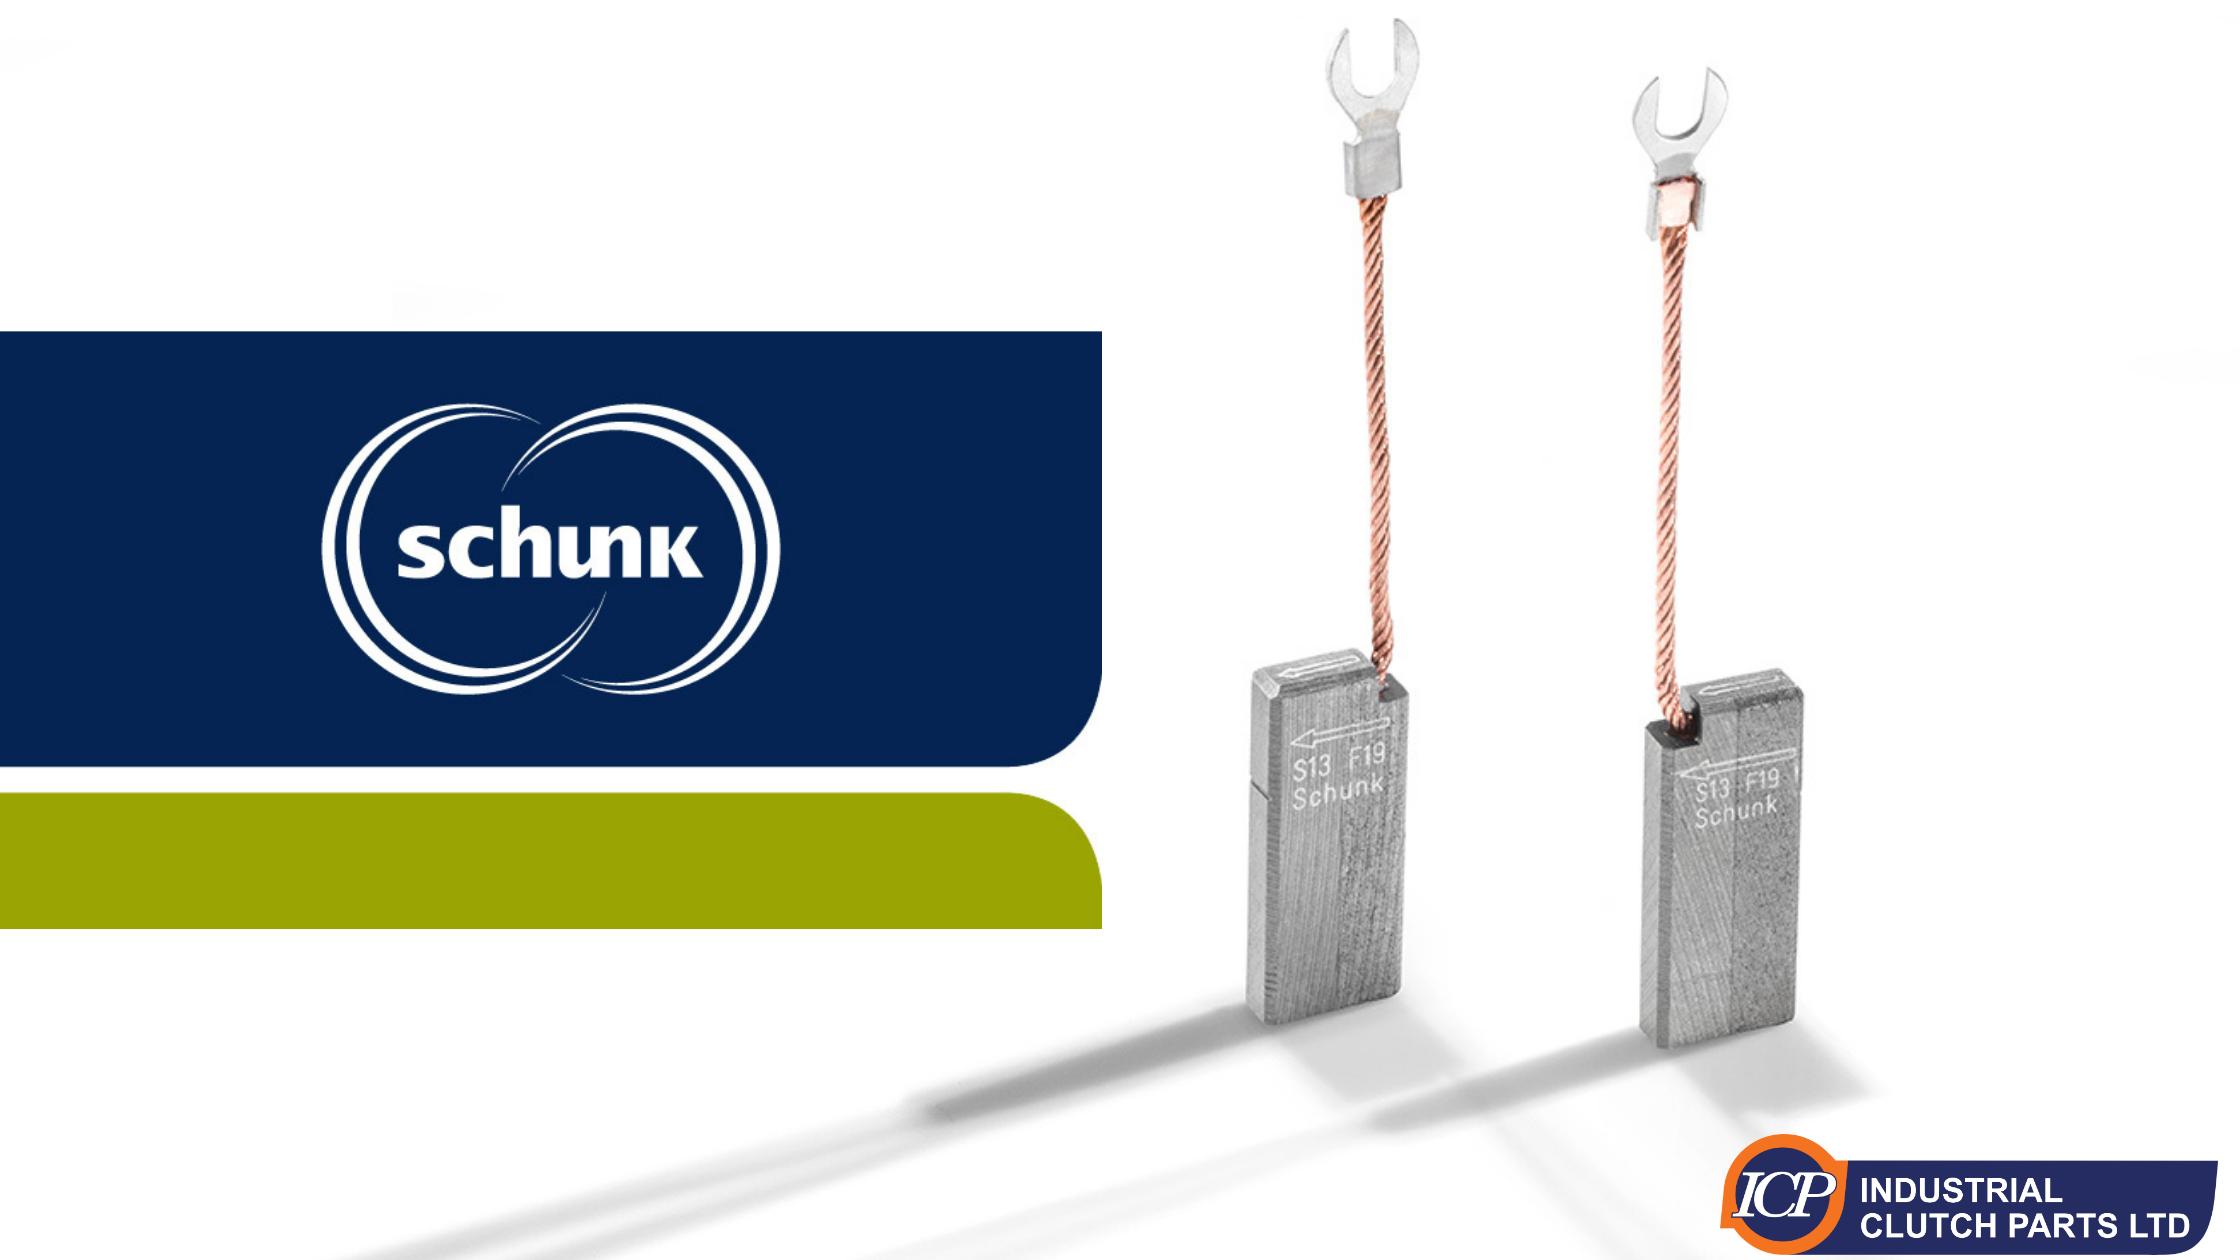 Schunk Carbon Technology - A New Partnership.